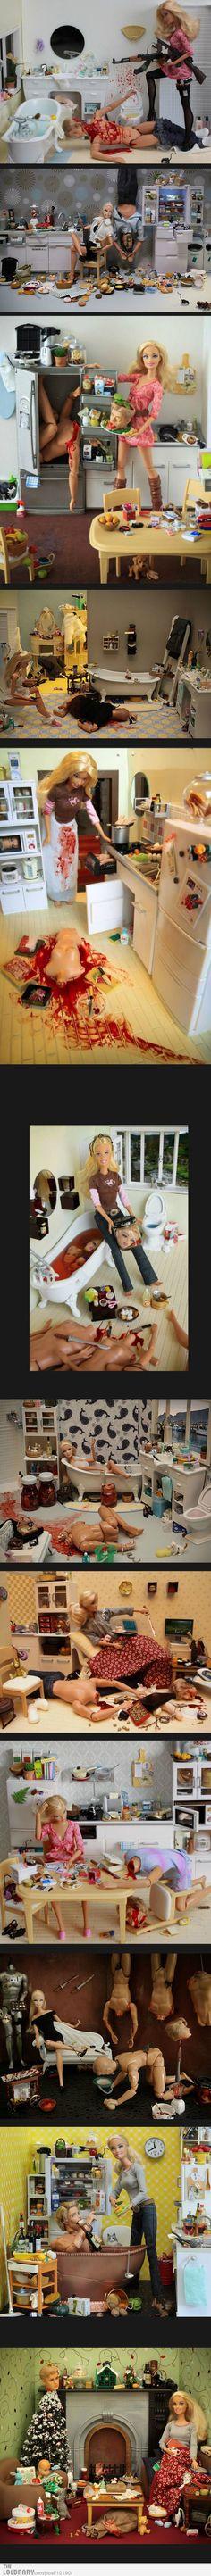 Barbie the Serial Killer